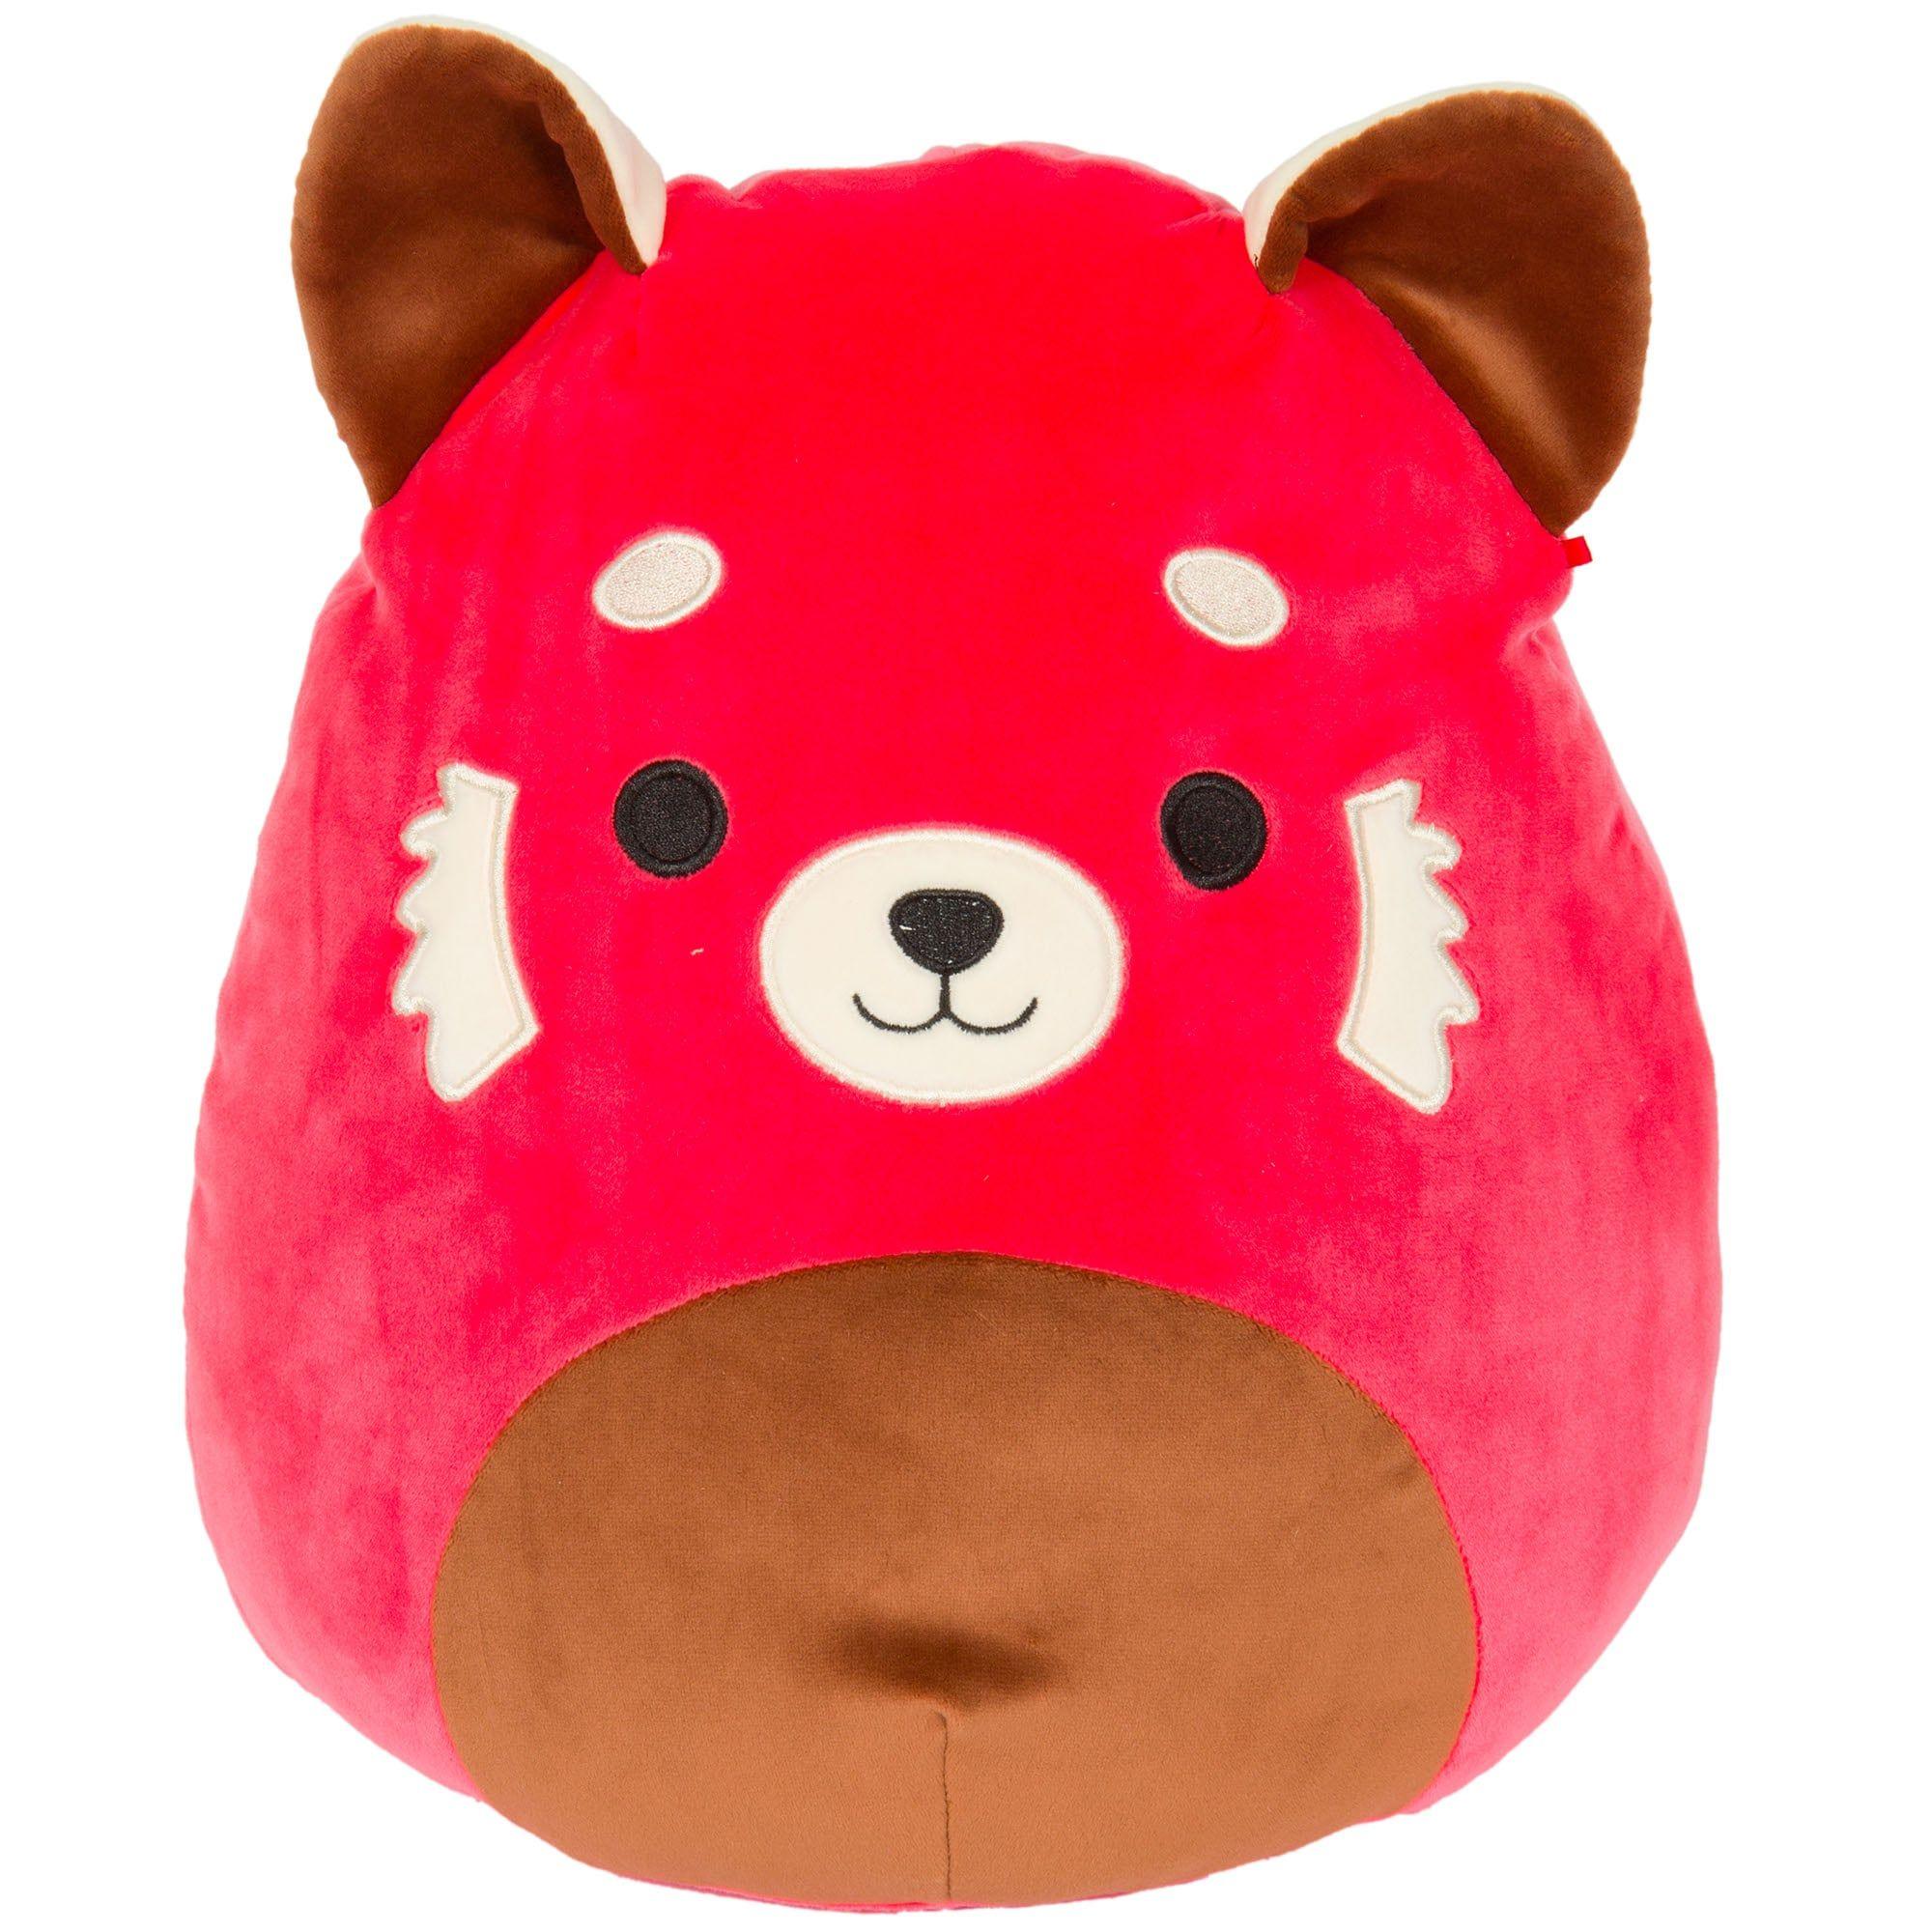 Super Soft Plush Toys Squishmallows Red Panda Collectable Plush Animal Pillows